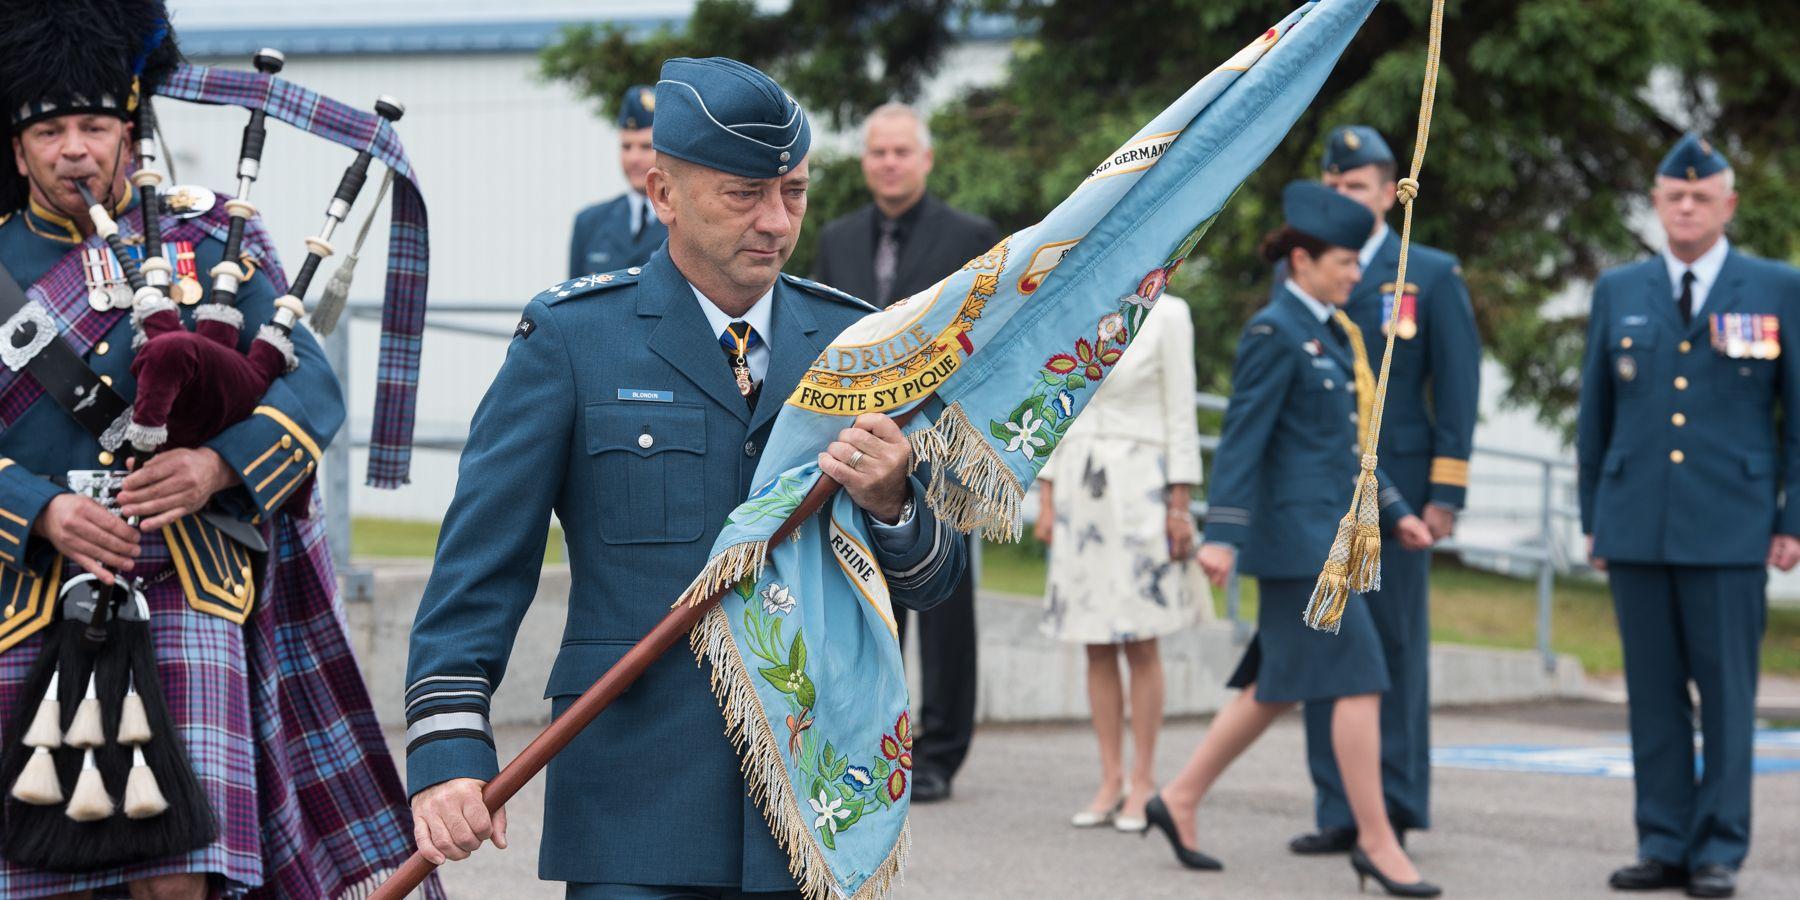 On June 9, 2015, Lieutenant-General Yvan Blondin, commander